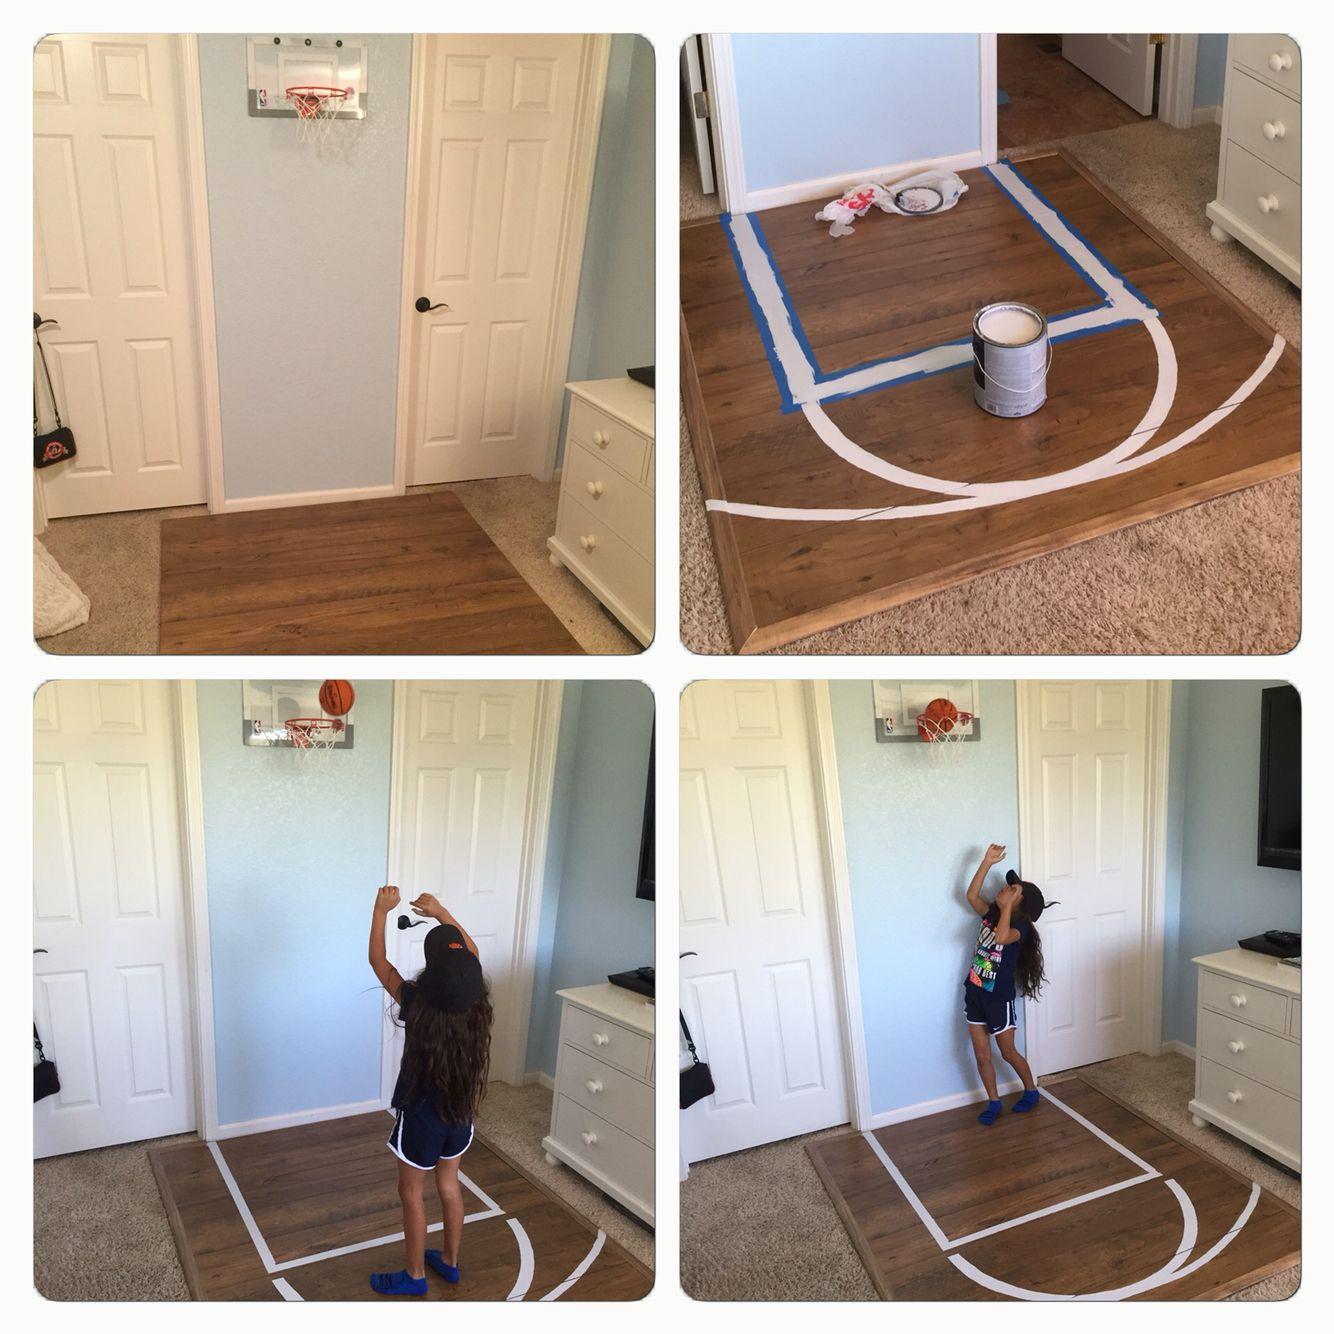 Boys basketball bedroom ideas - Bedroom Basketball Court Half Court Kids Room Ideas Diy Left Over Laminate